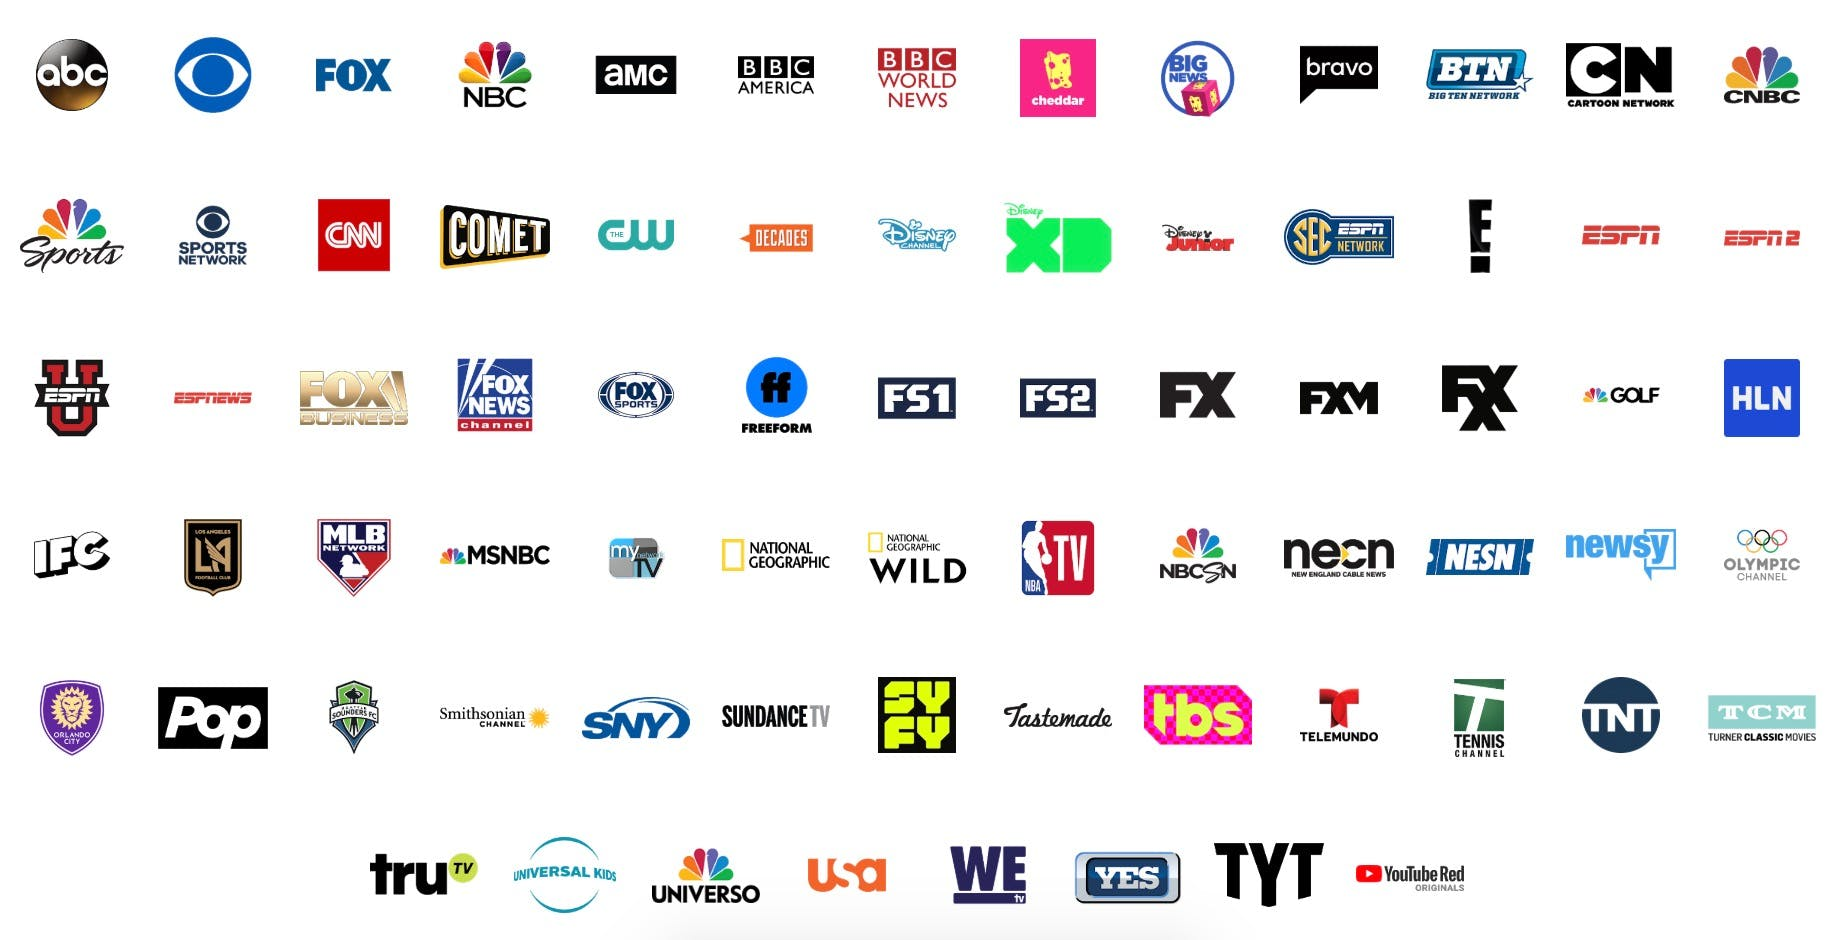 golden globes live stream youtube tv channels